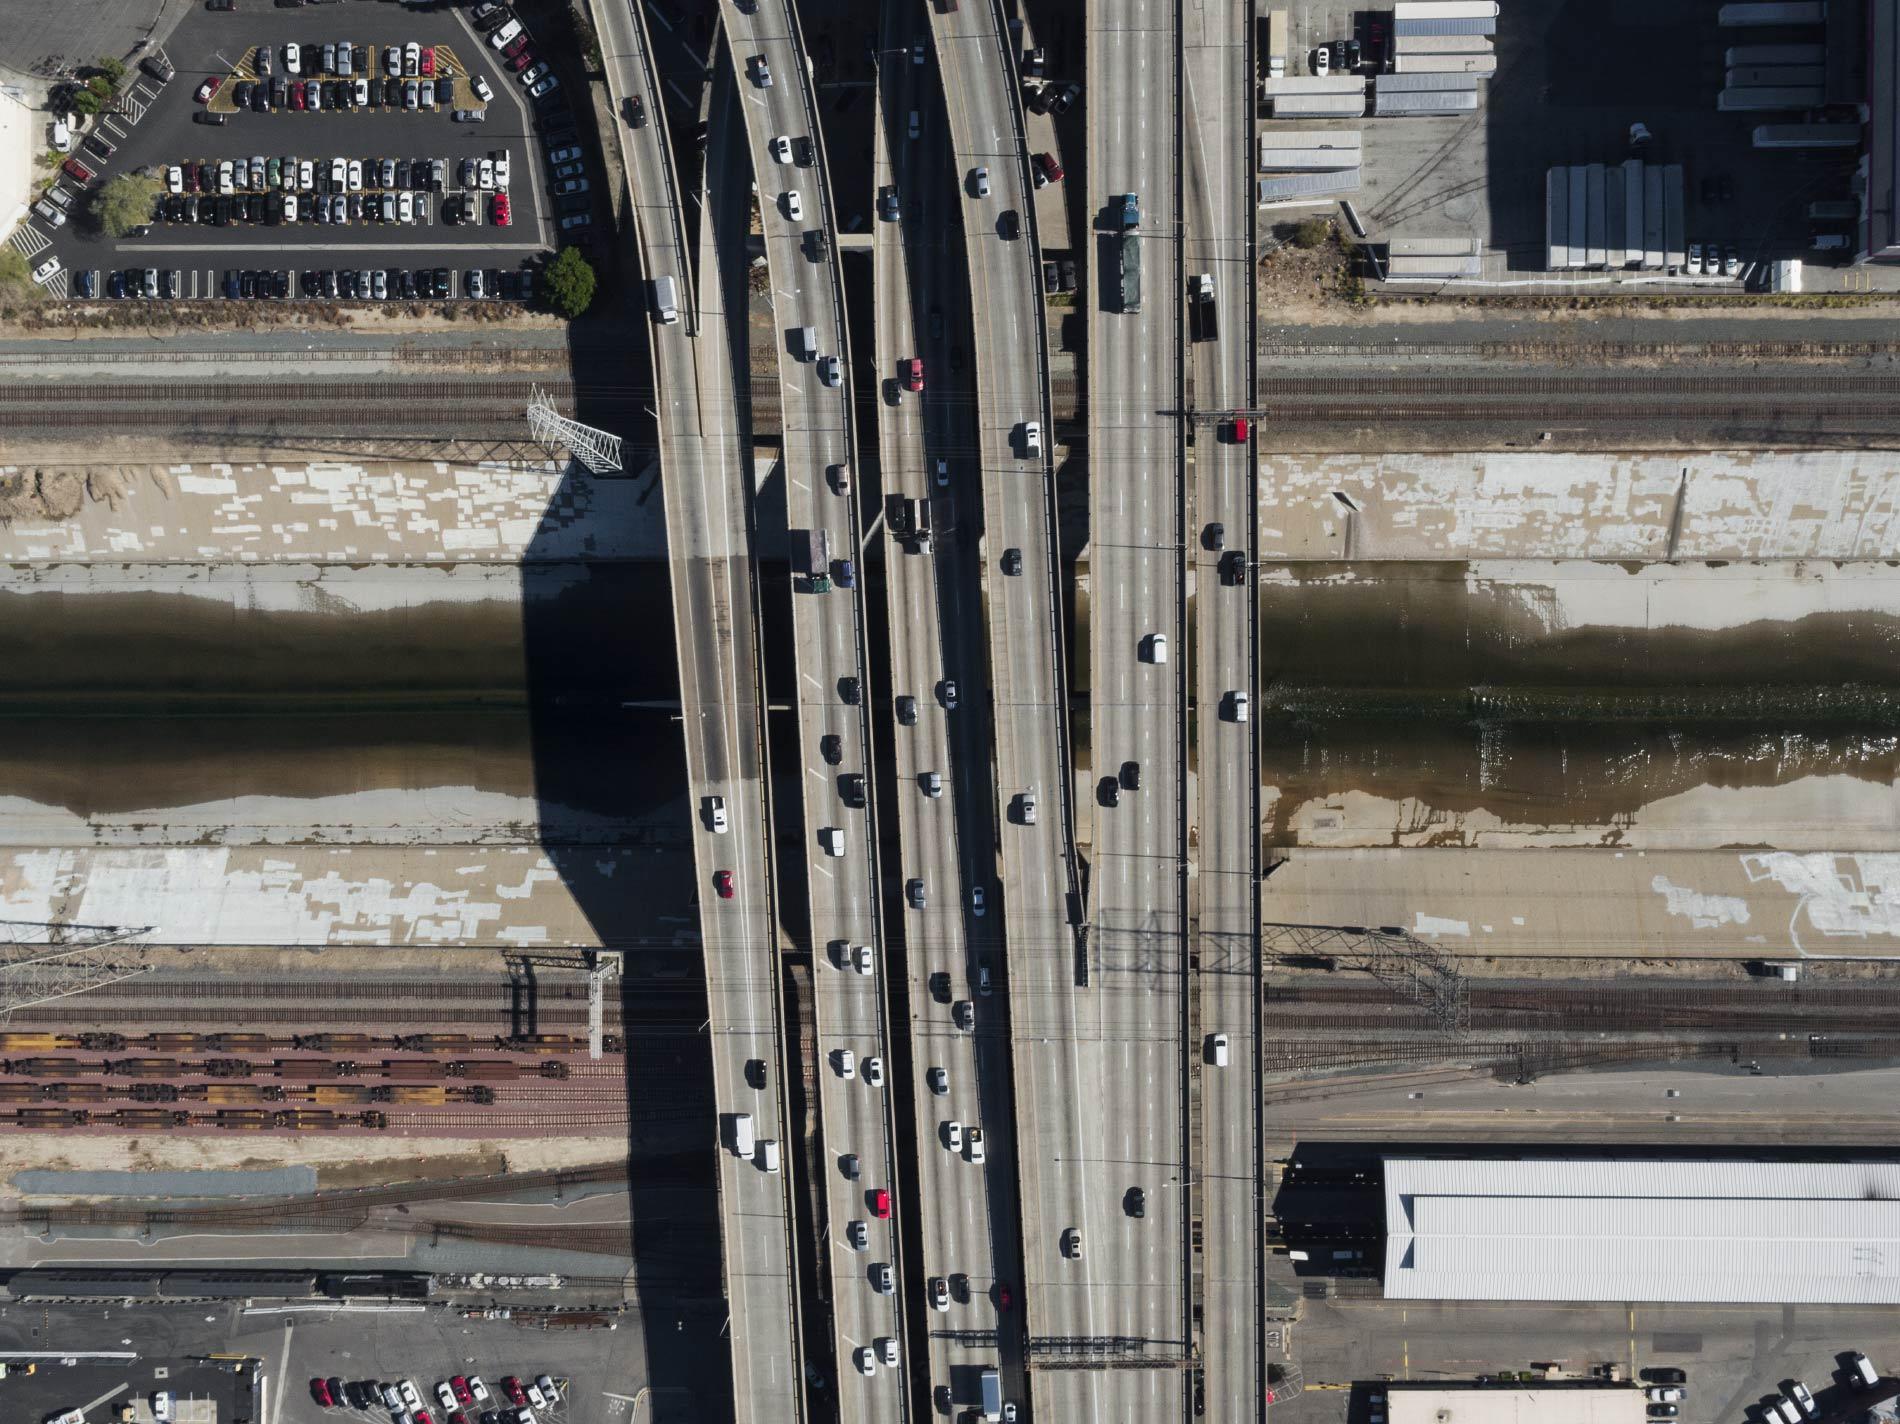 LA_River_drone_160112_02.jpg